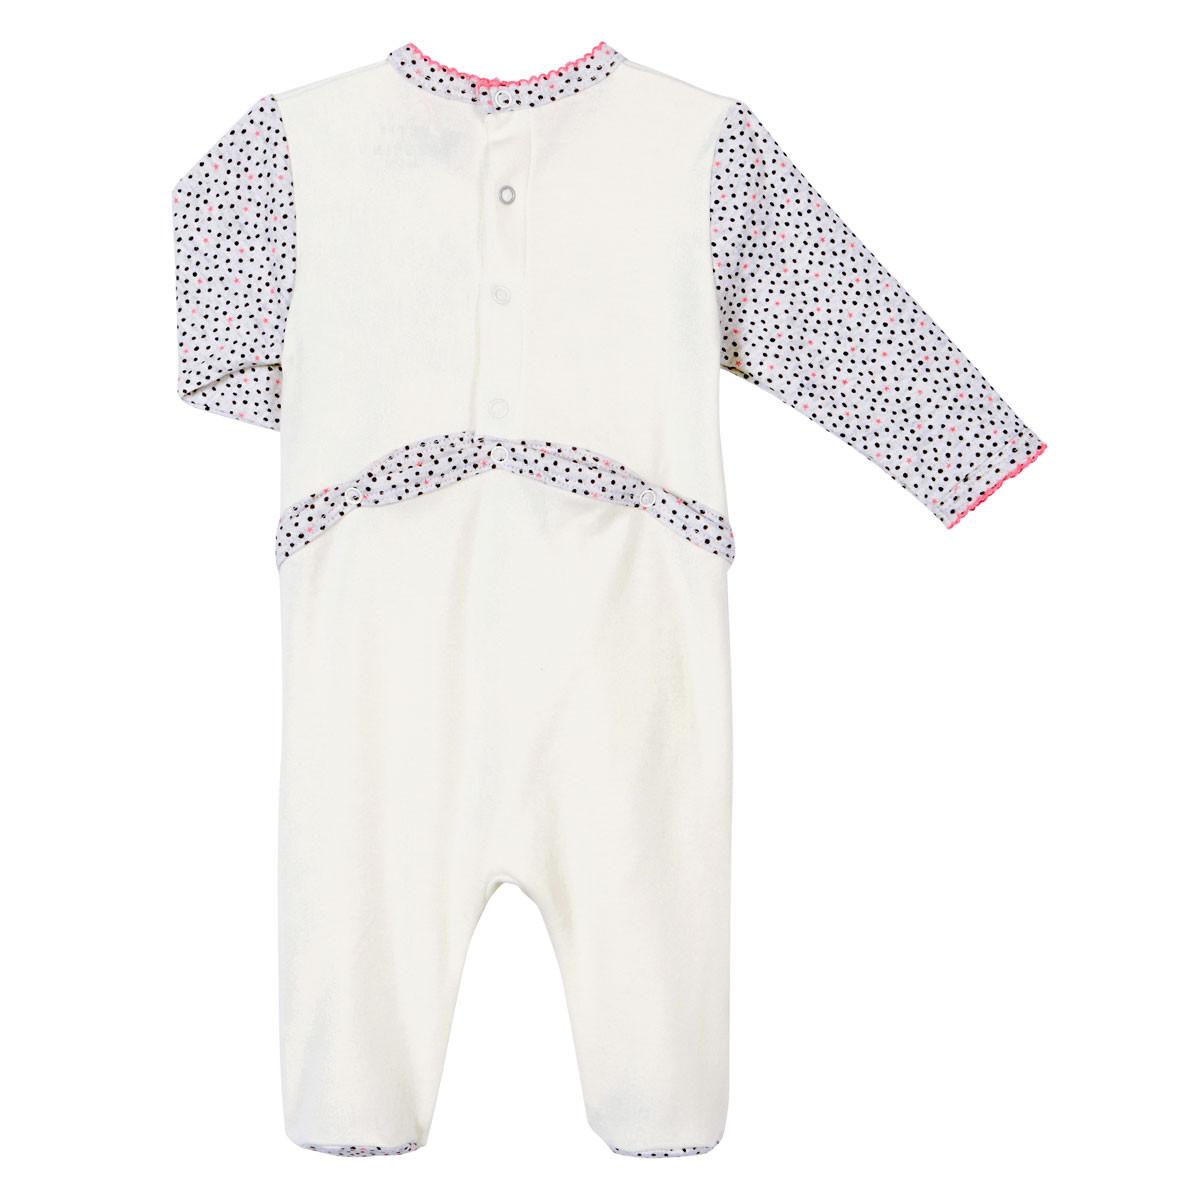 Pyjama bébé fille Chatbada dos